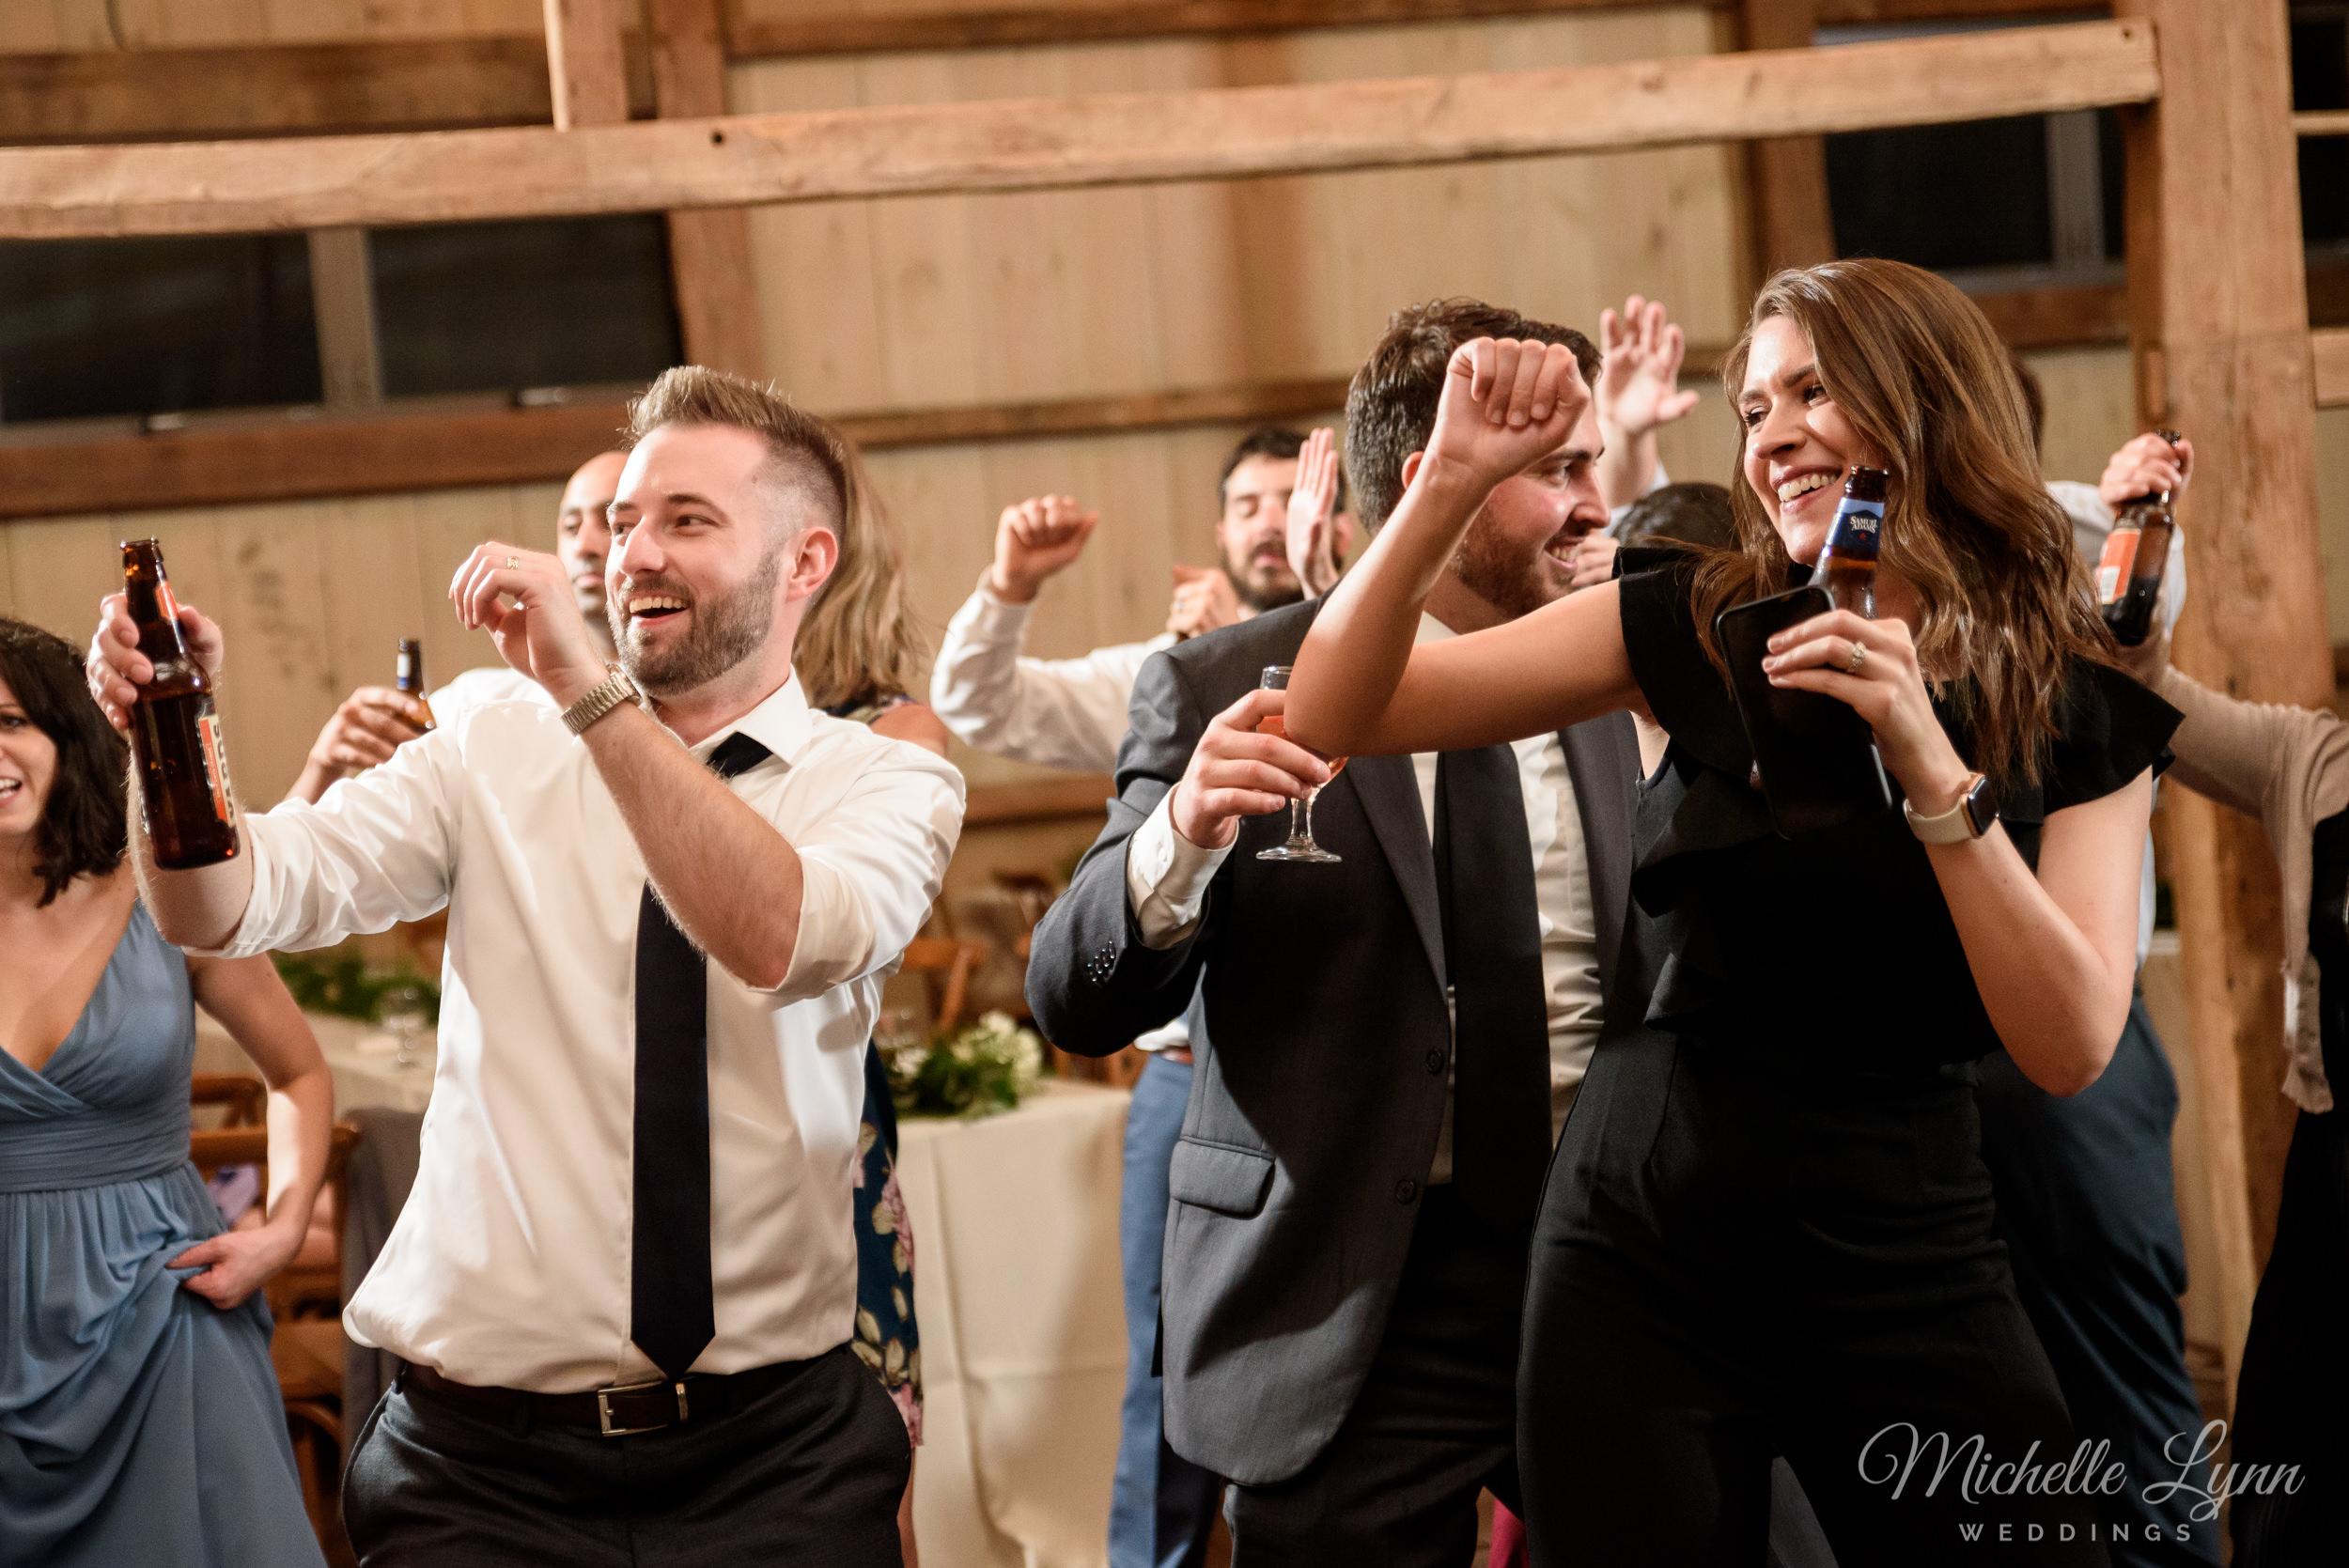 mlw-the-farm-bakery-and-events-wedding-photos-96.jpg